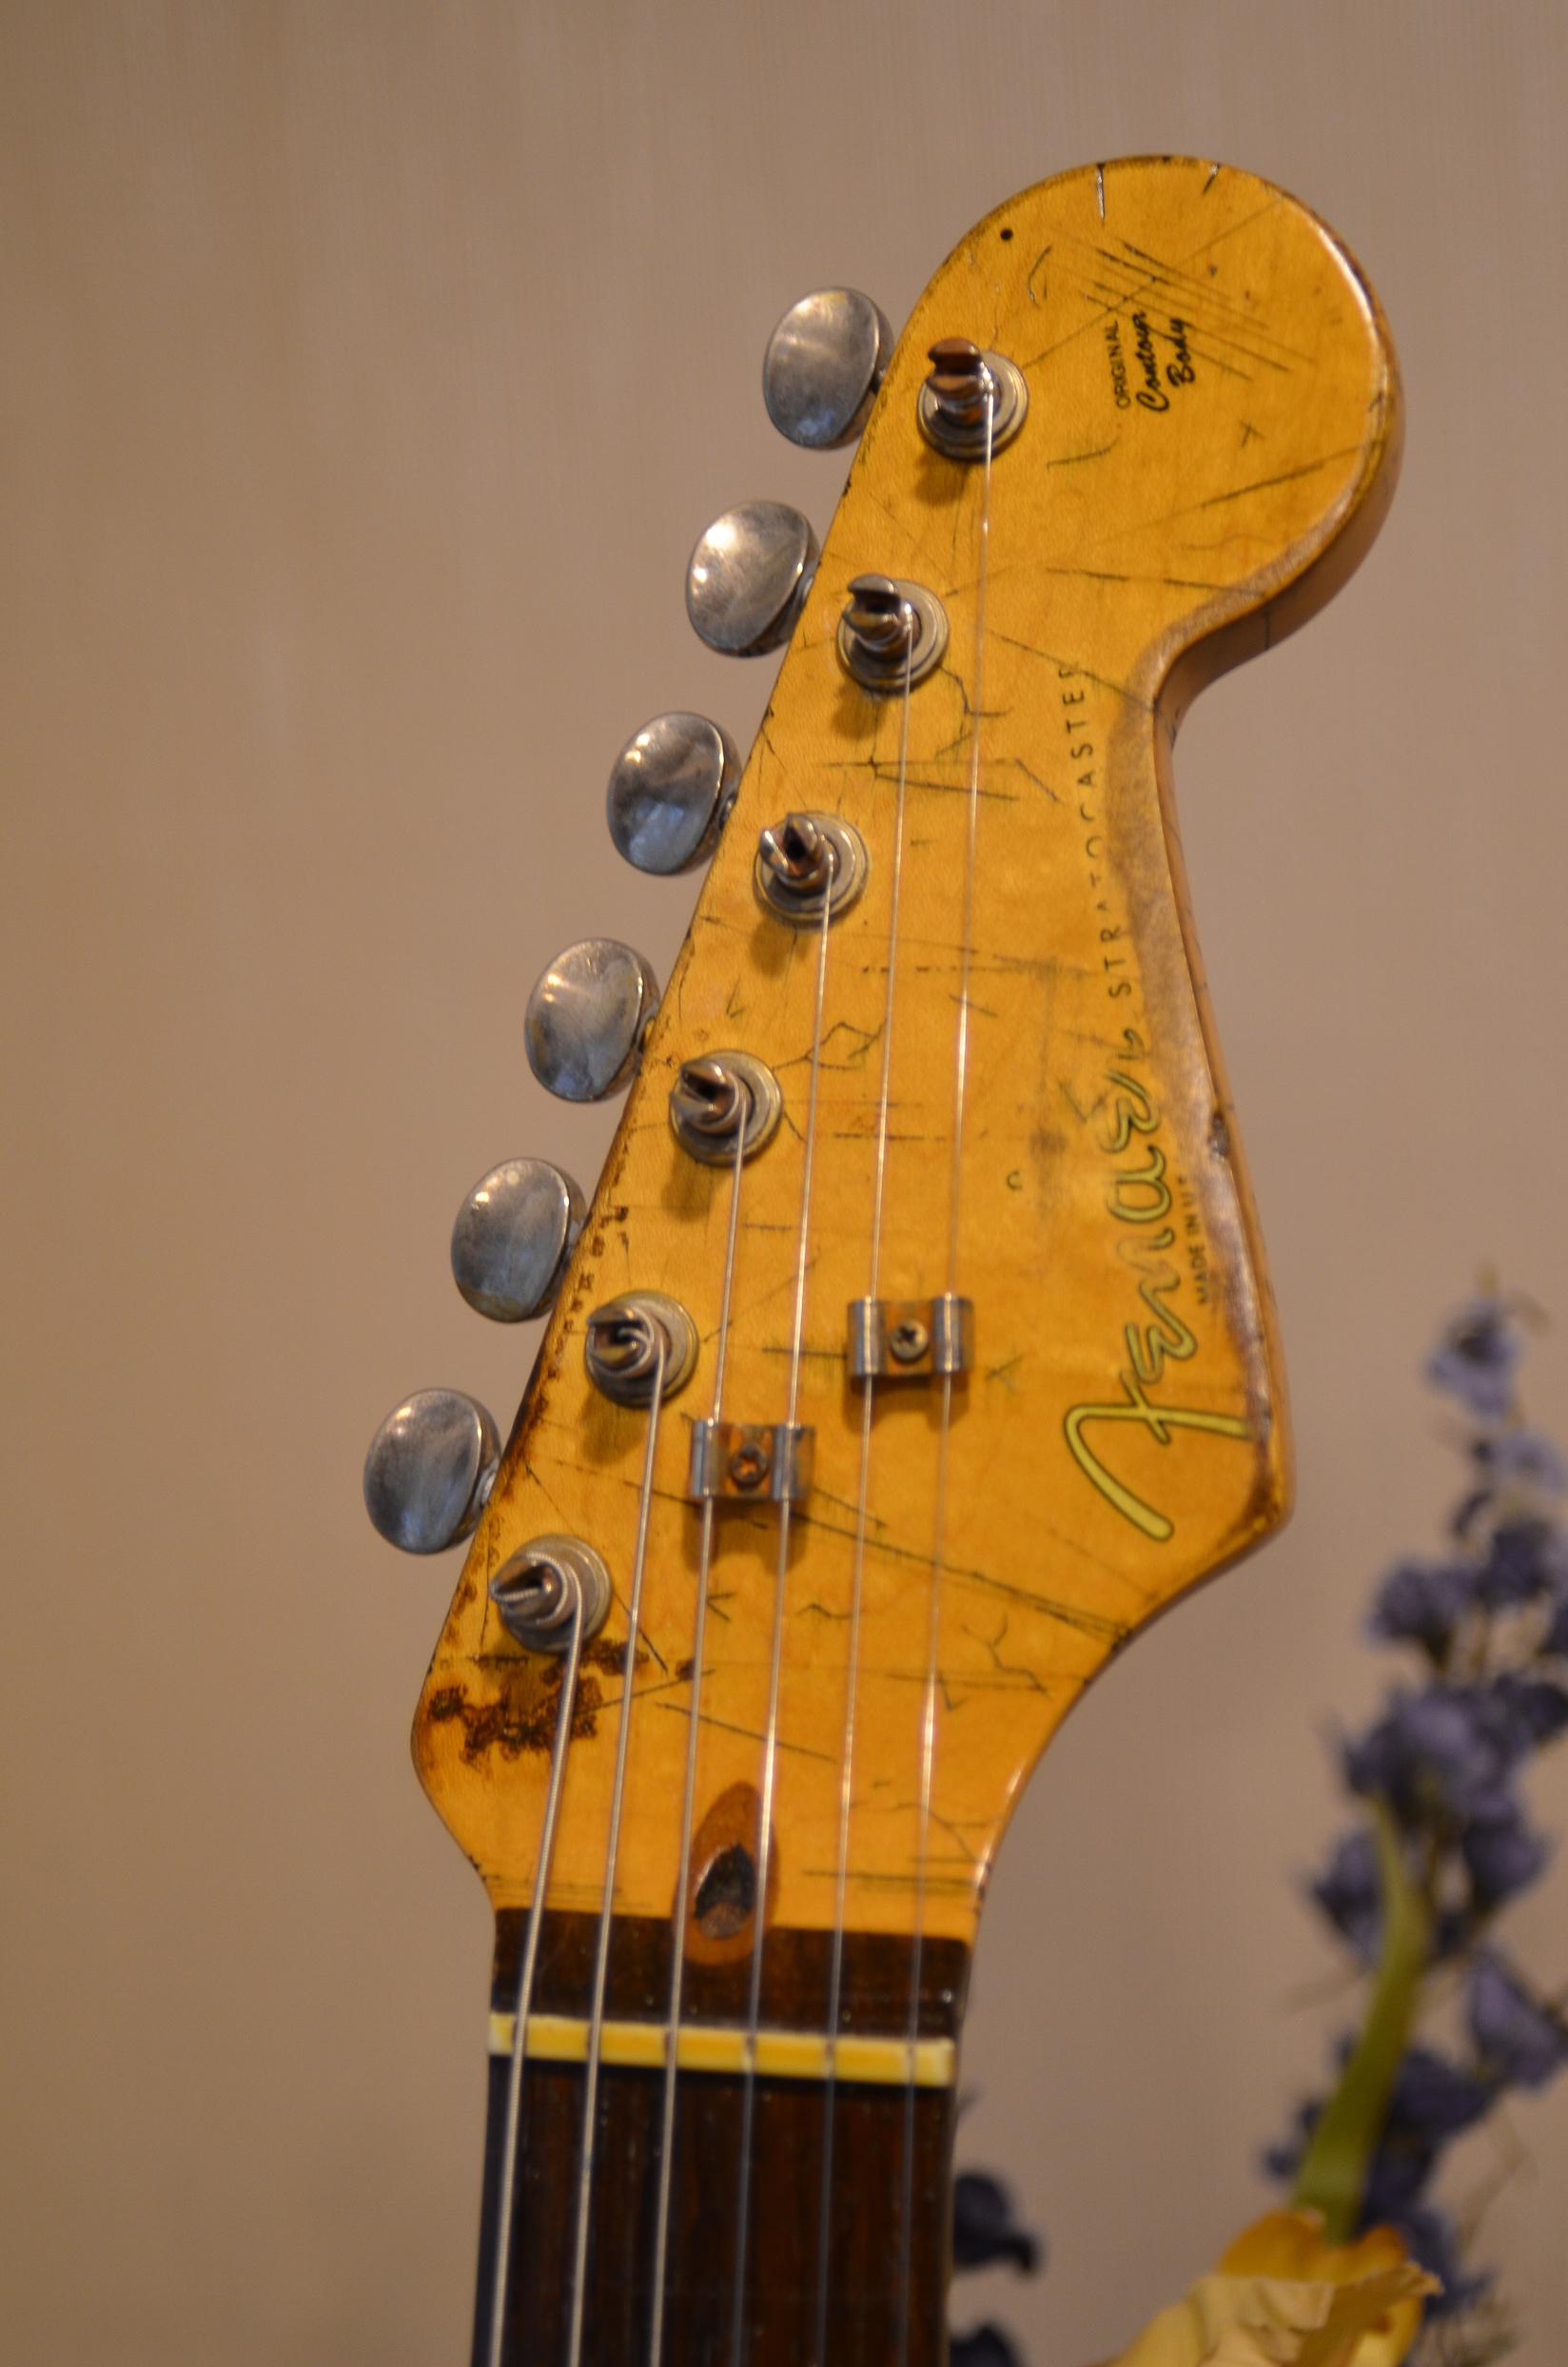 Fender Stratocaster Heavy Relic Vintage Tuners Headstock Guitarwacky.com